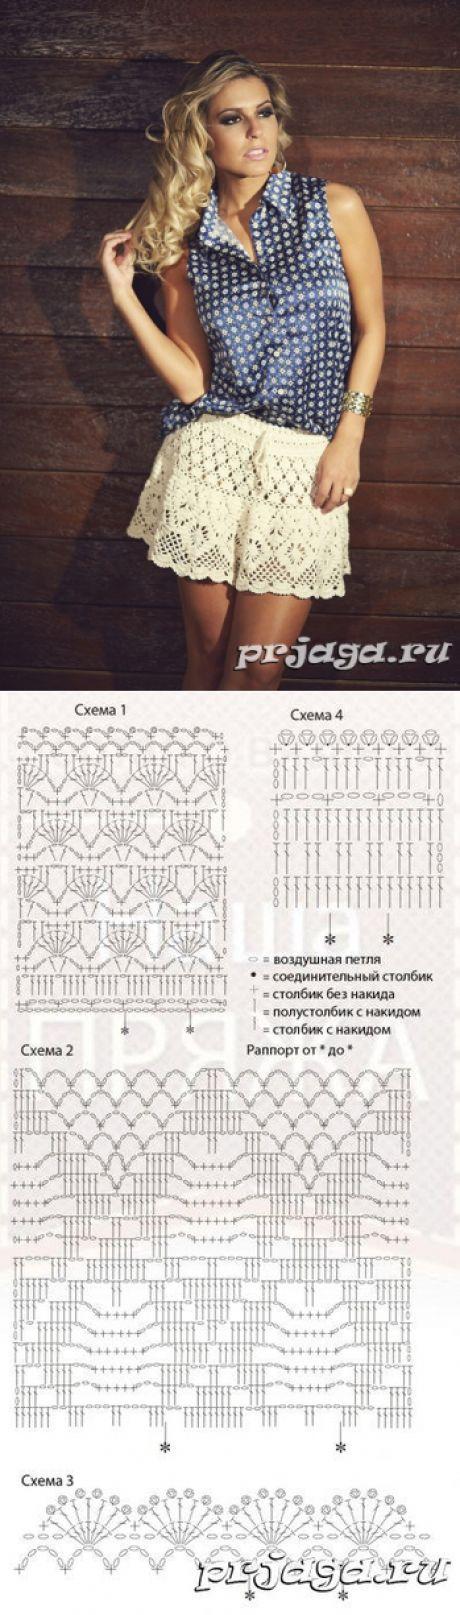 Бежевая юбка красивыми узорами